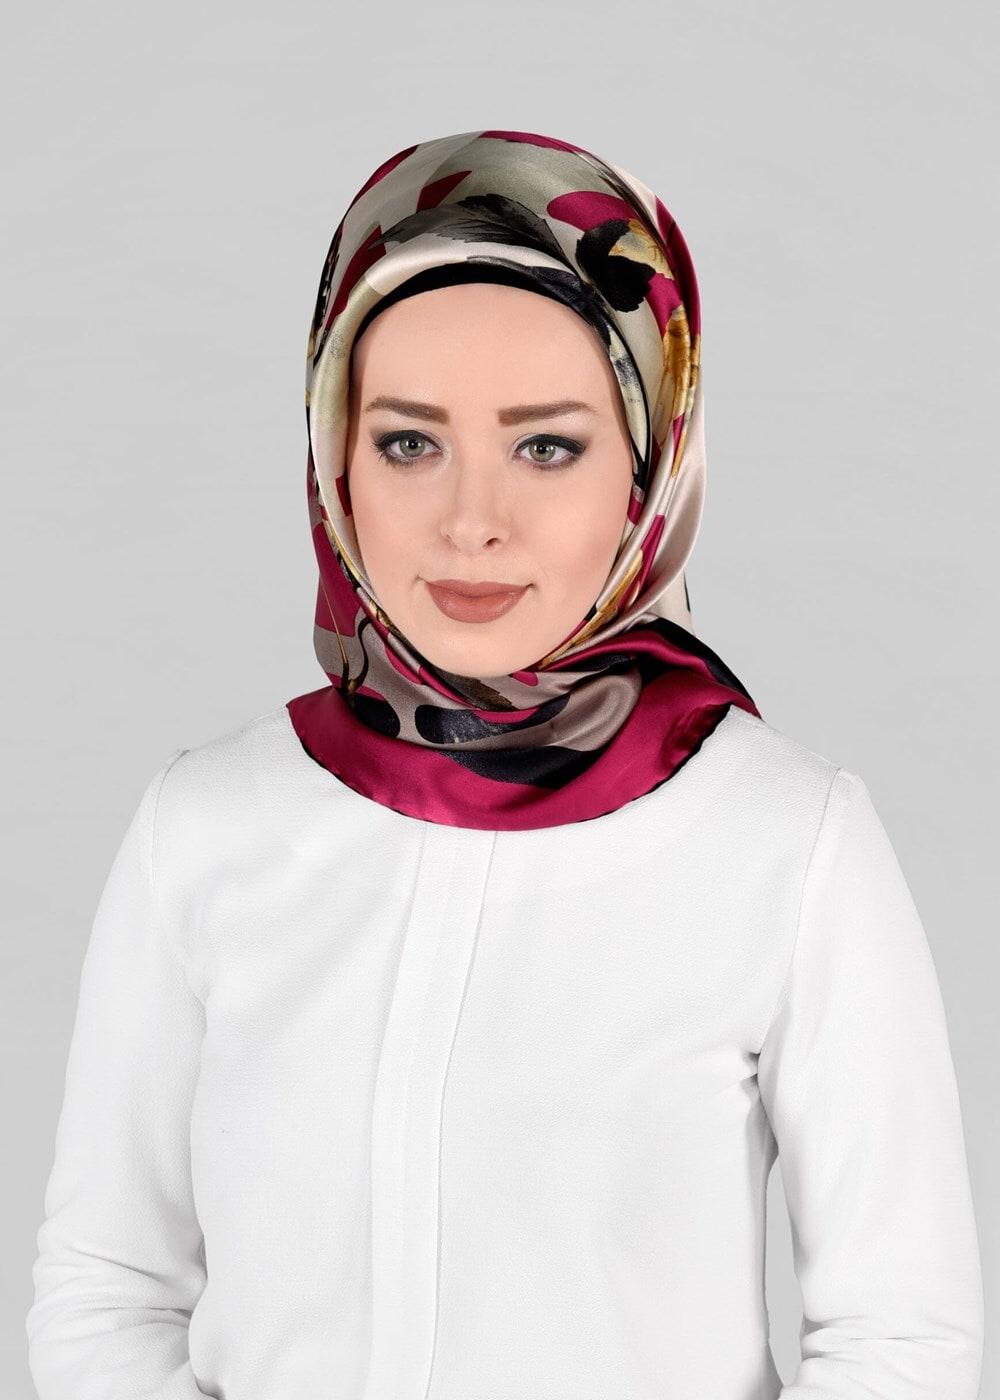 Bayan FUŞYA T 13288-1 ALVİNA İPEK EŞARP